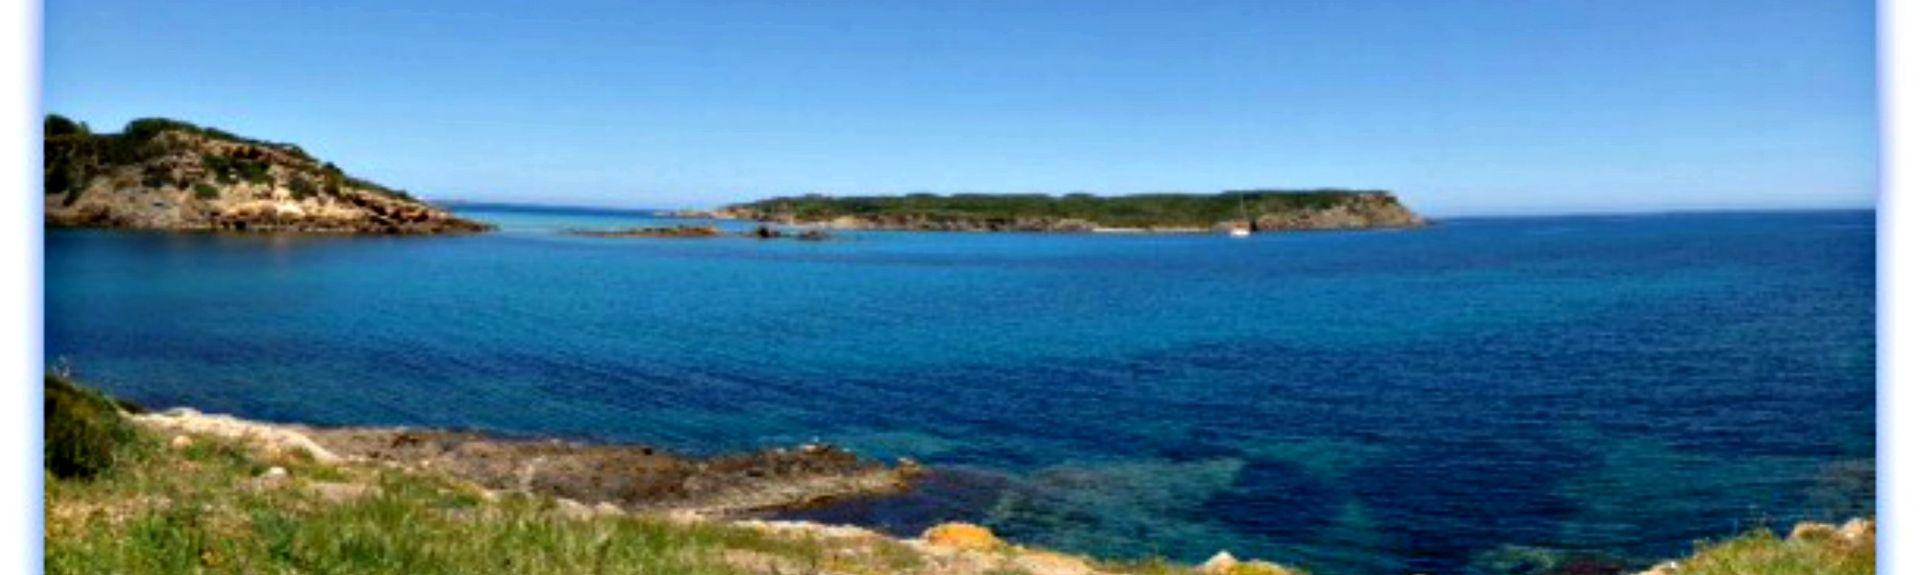 Punta Prima, Balearic Islands, Spain